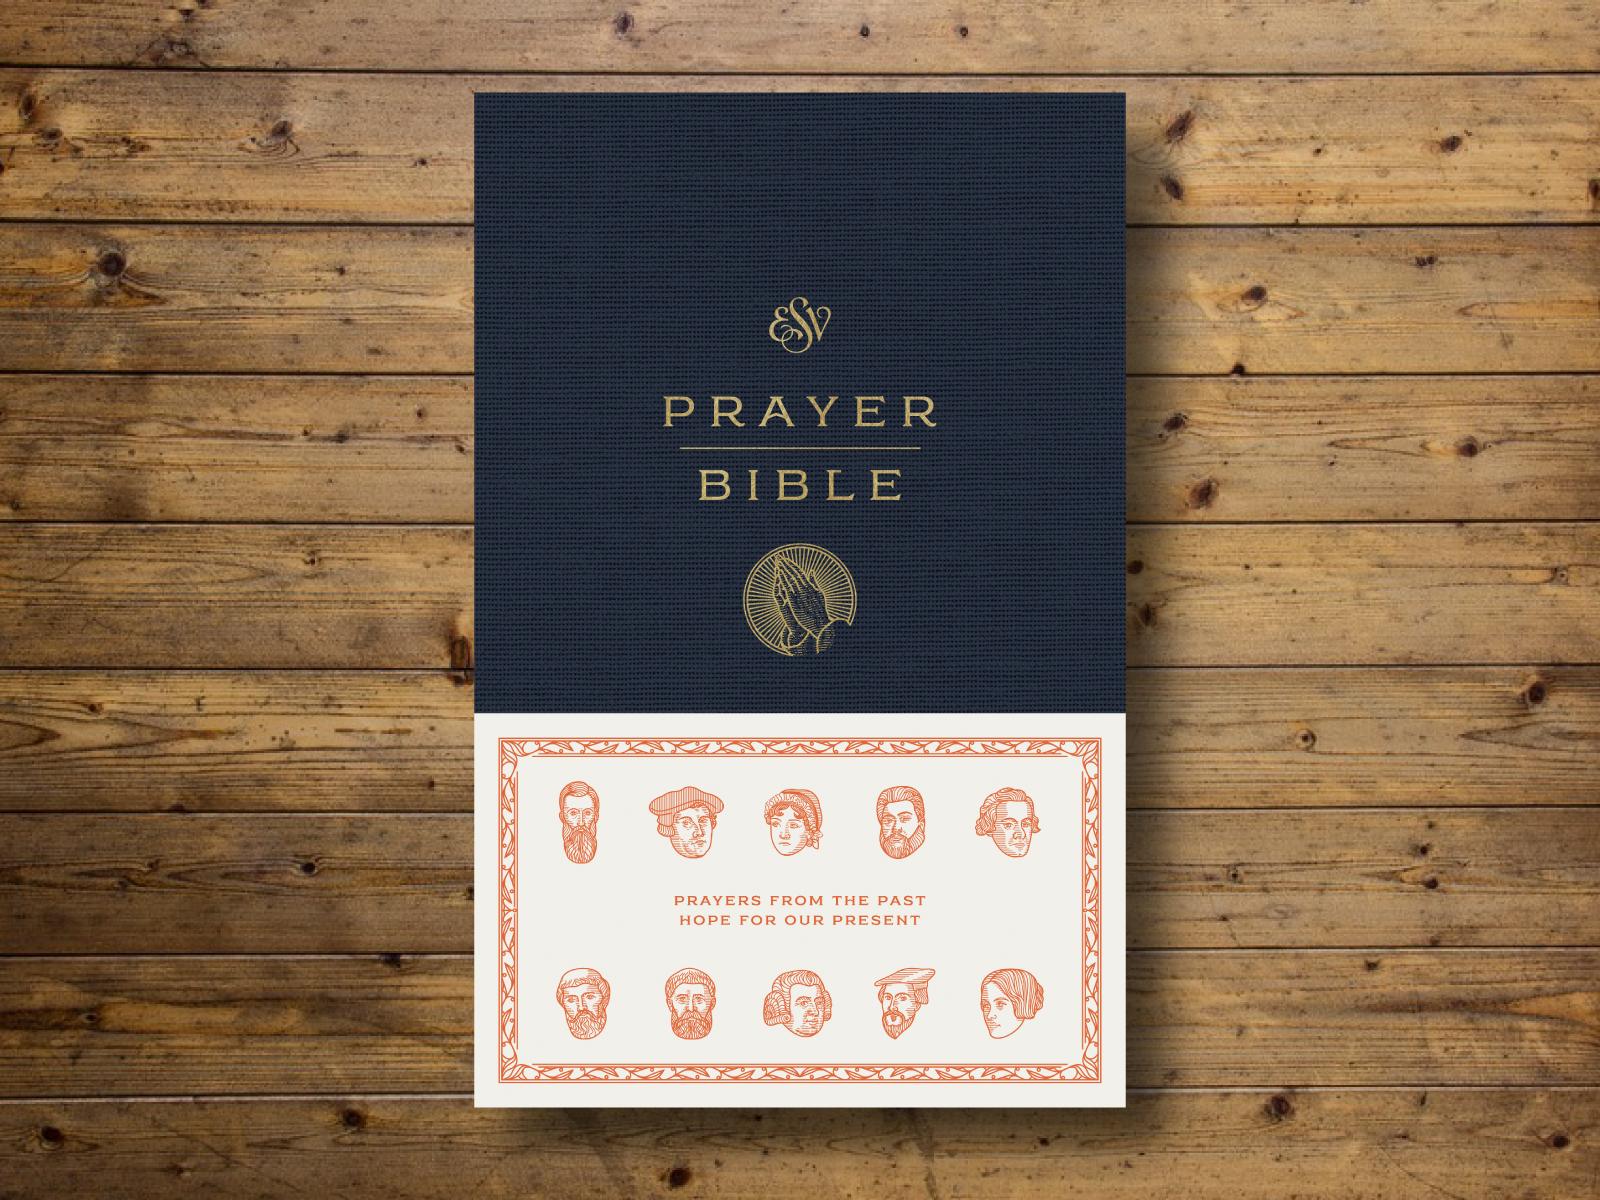 Prayerbibledr 01